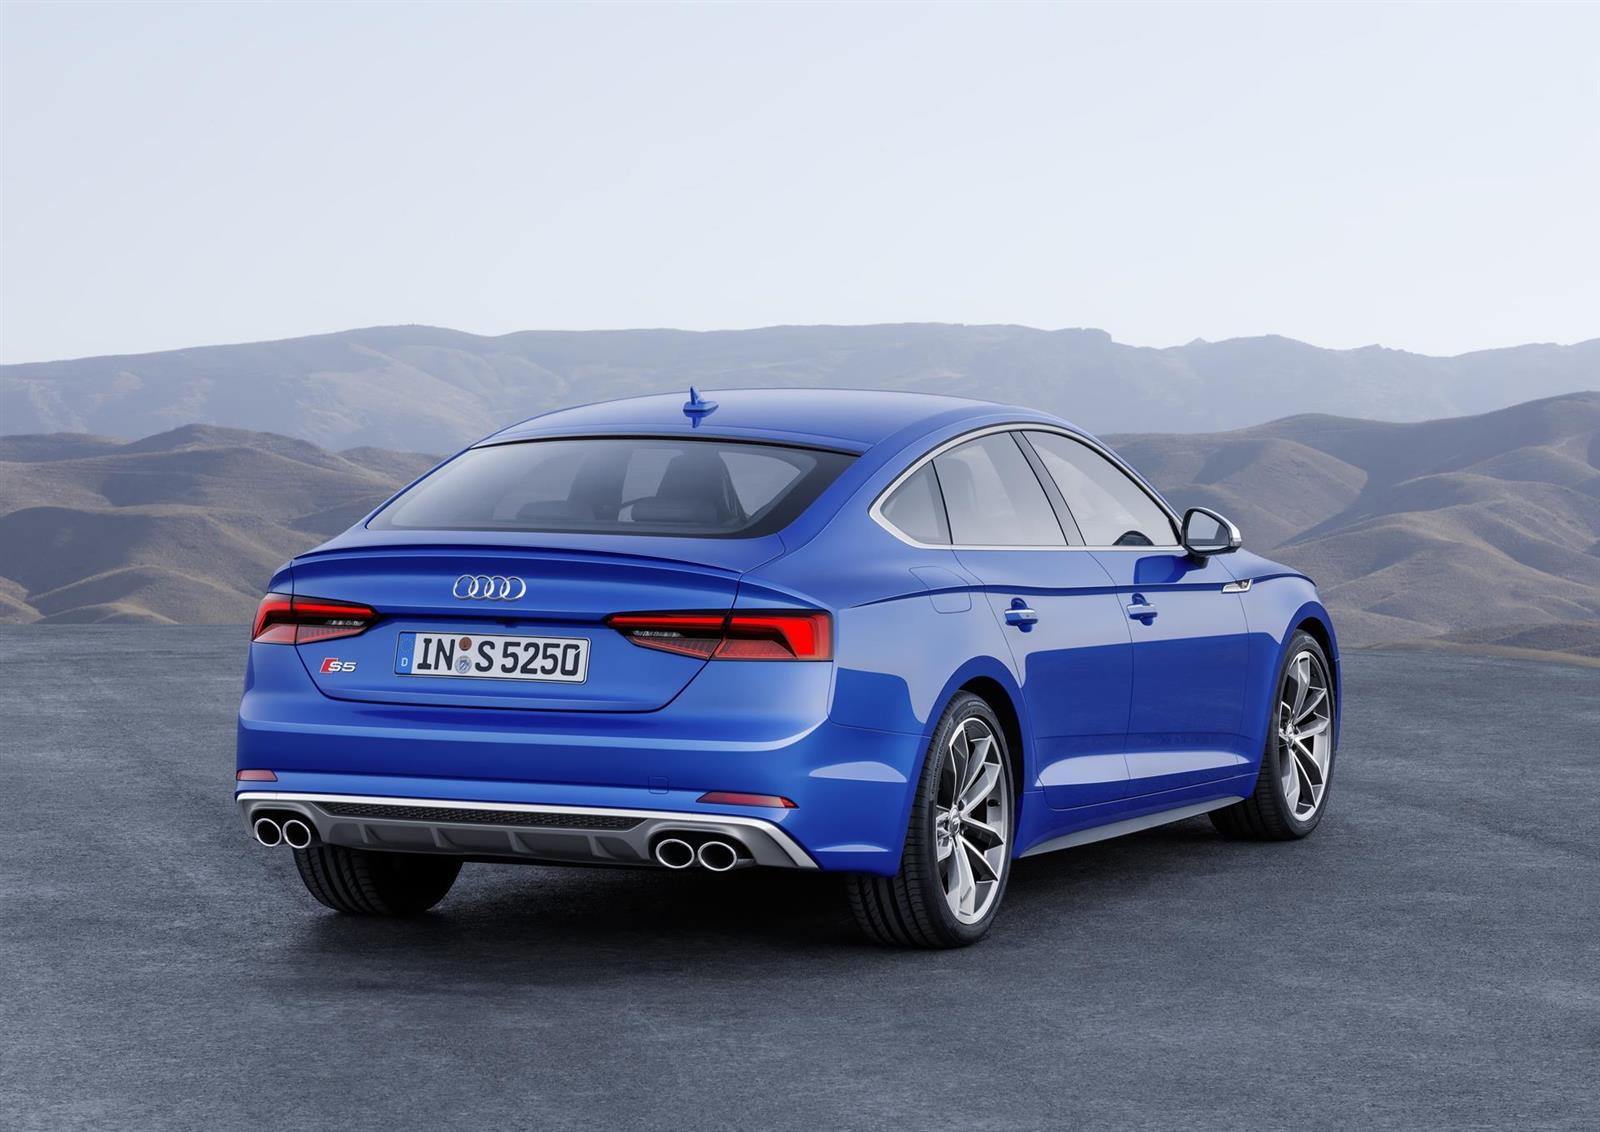 http://www.conceptcarz.com/images/Audi/Audi-S5-Sportback-image-05-1600.jpg